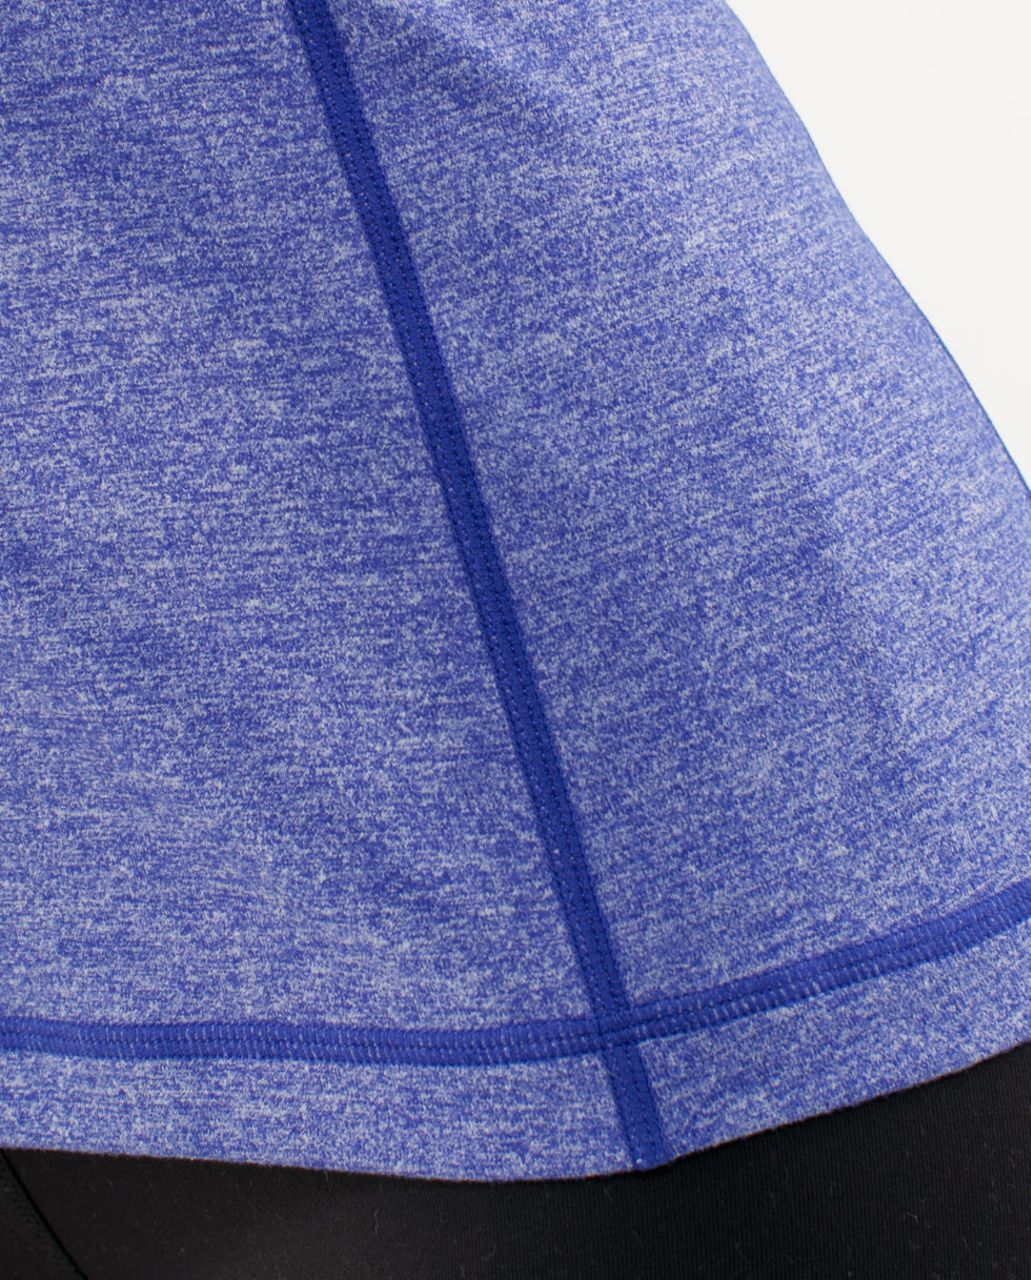 Lululemon Scoop Neck Tank - Heathered Pigment Blue /  Pigment Blue